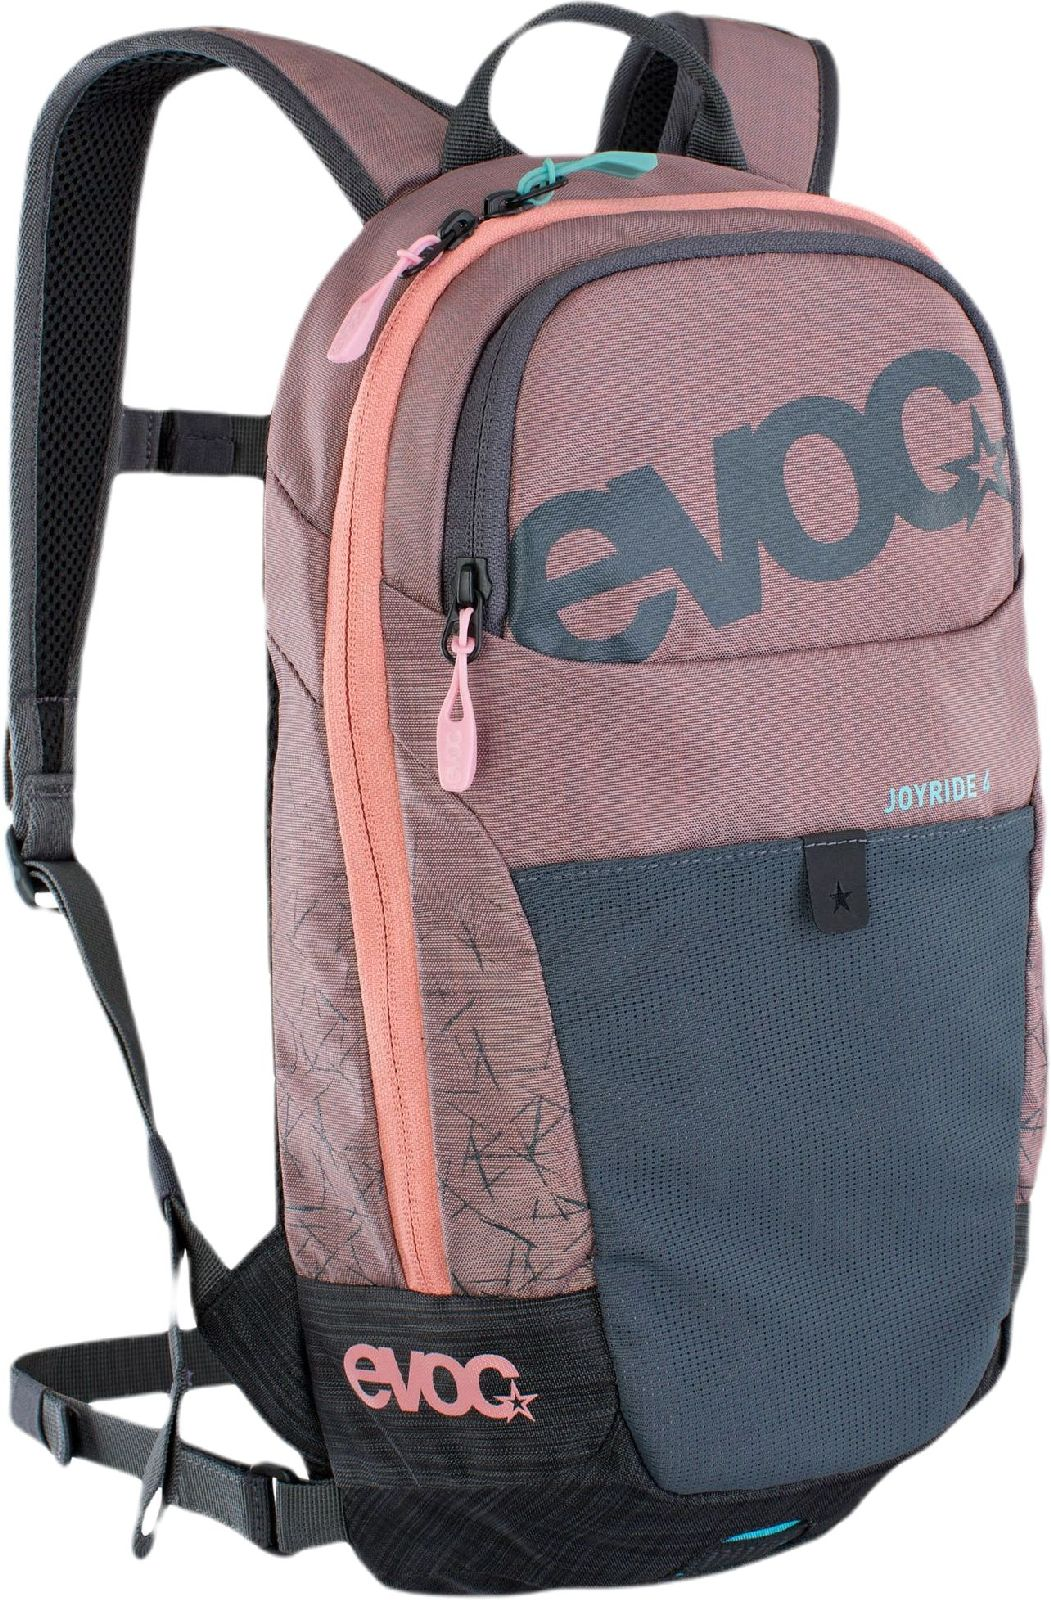 Evoc Joyride 4L - dusty pink/carbon grey uni